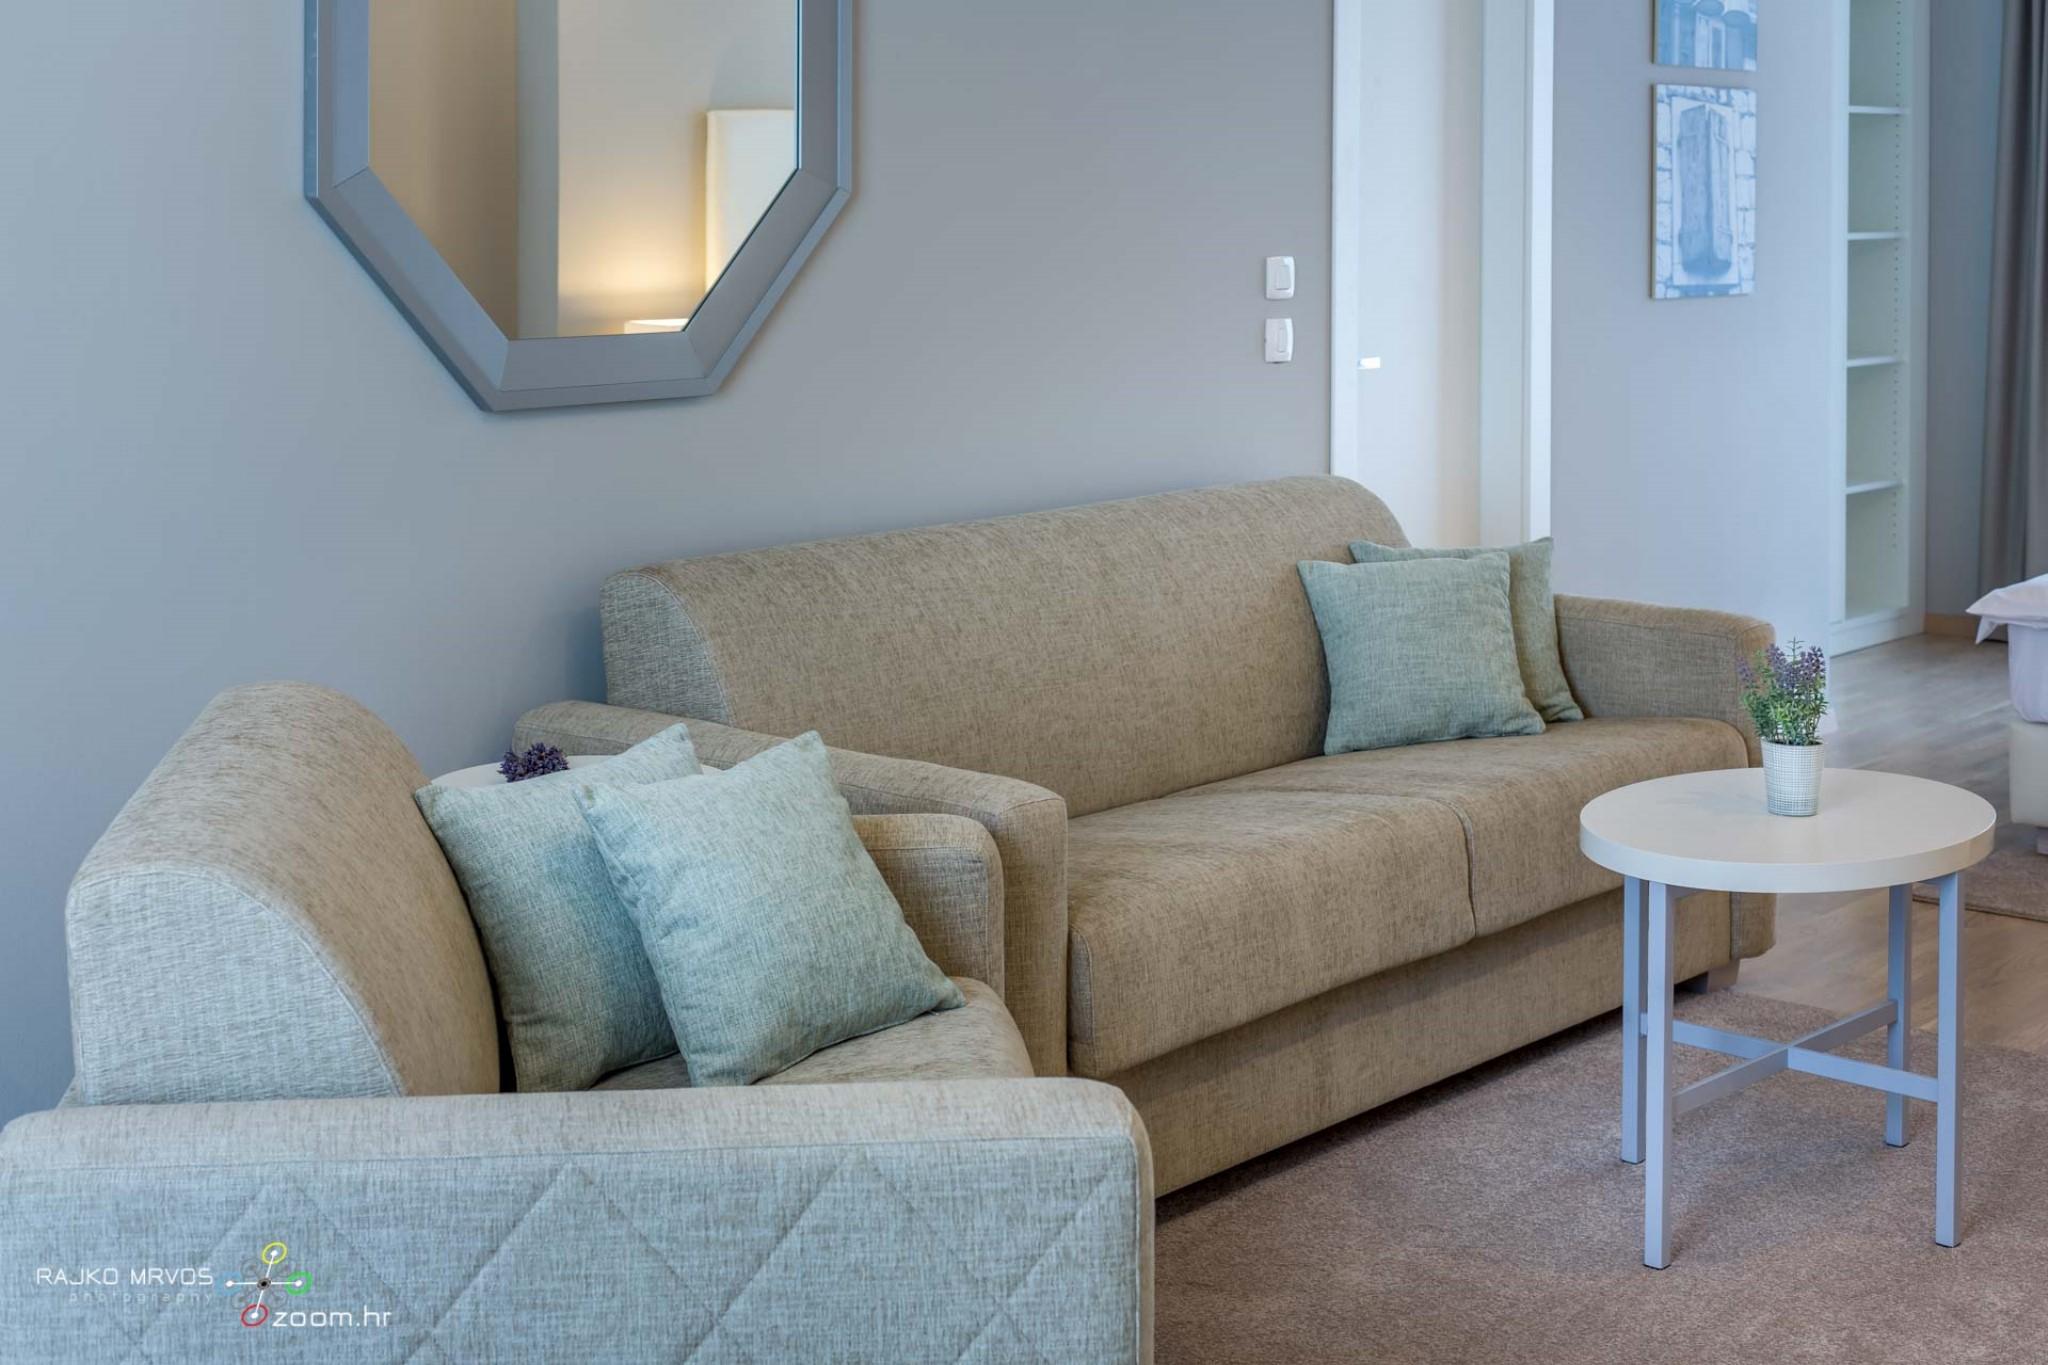 fotografiranje-interijera-fotograf-eksterijera-apartmana-vila-kuca-apartman-Preelook-38